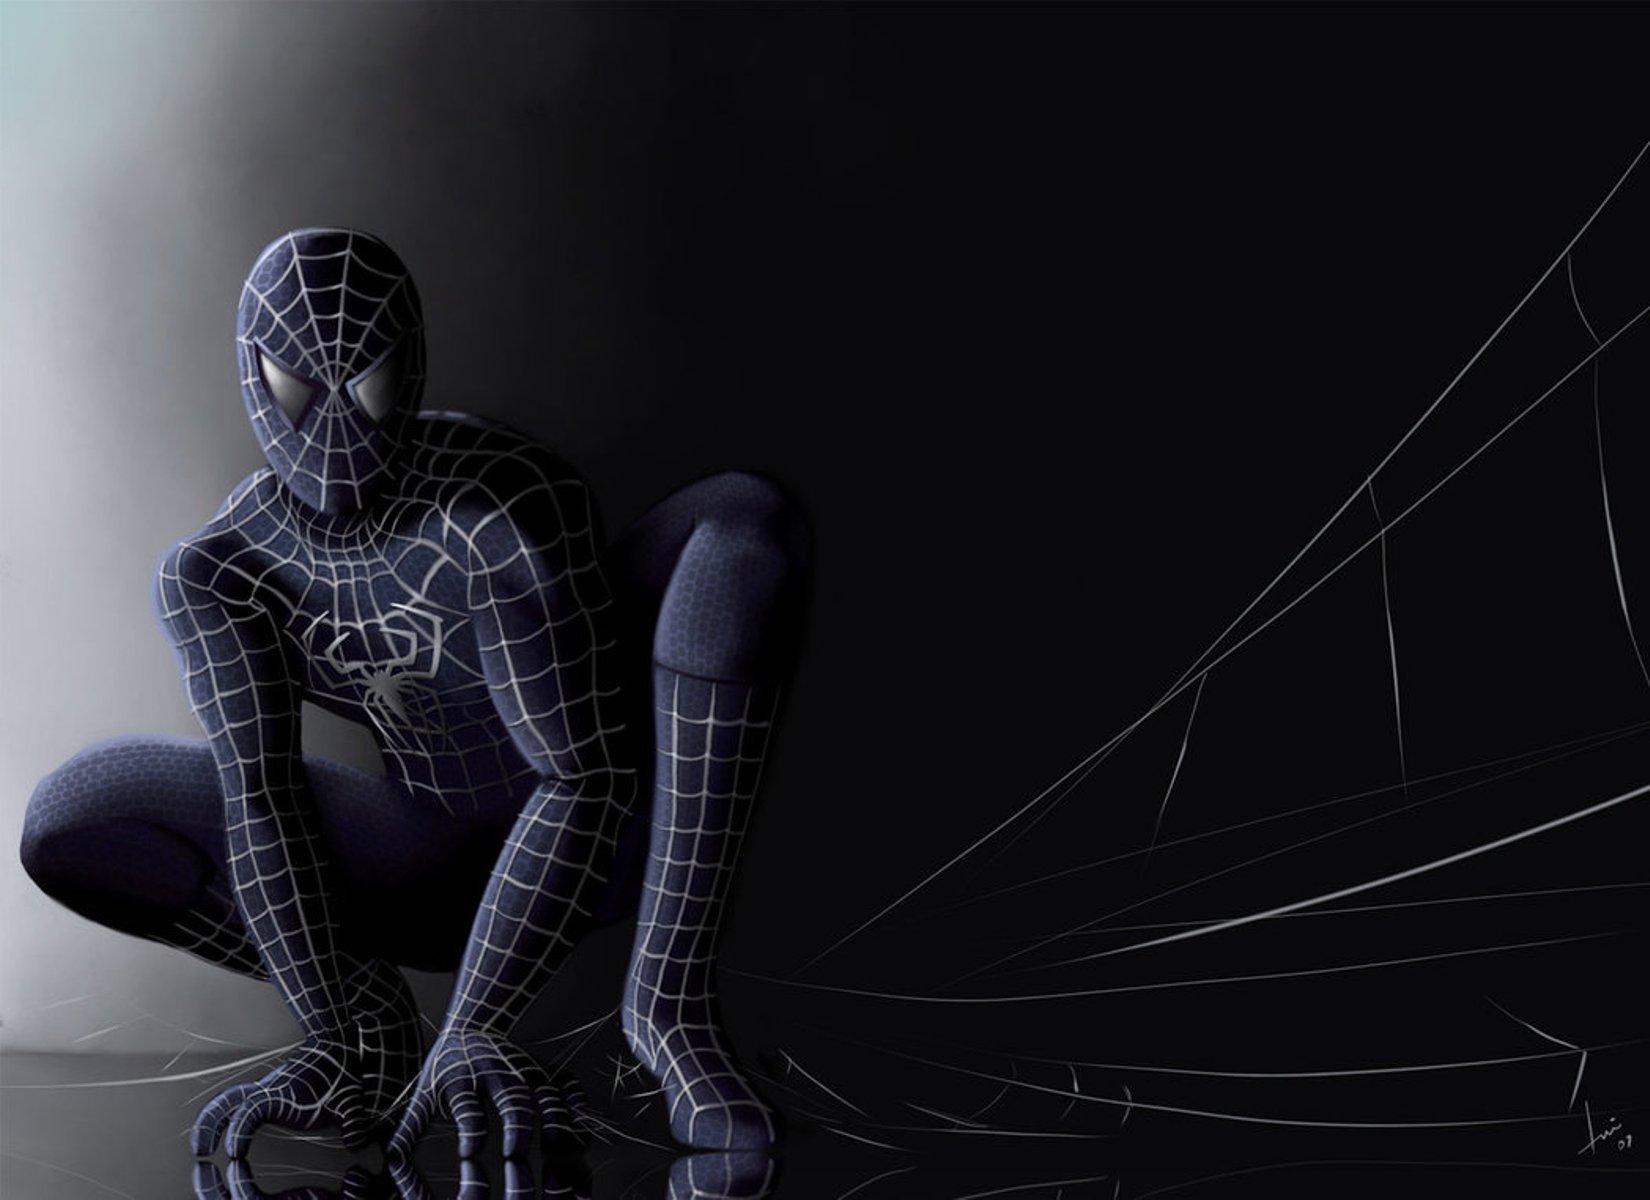 spiderman wallappers for desktop (18)